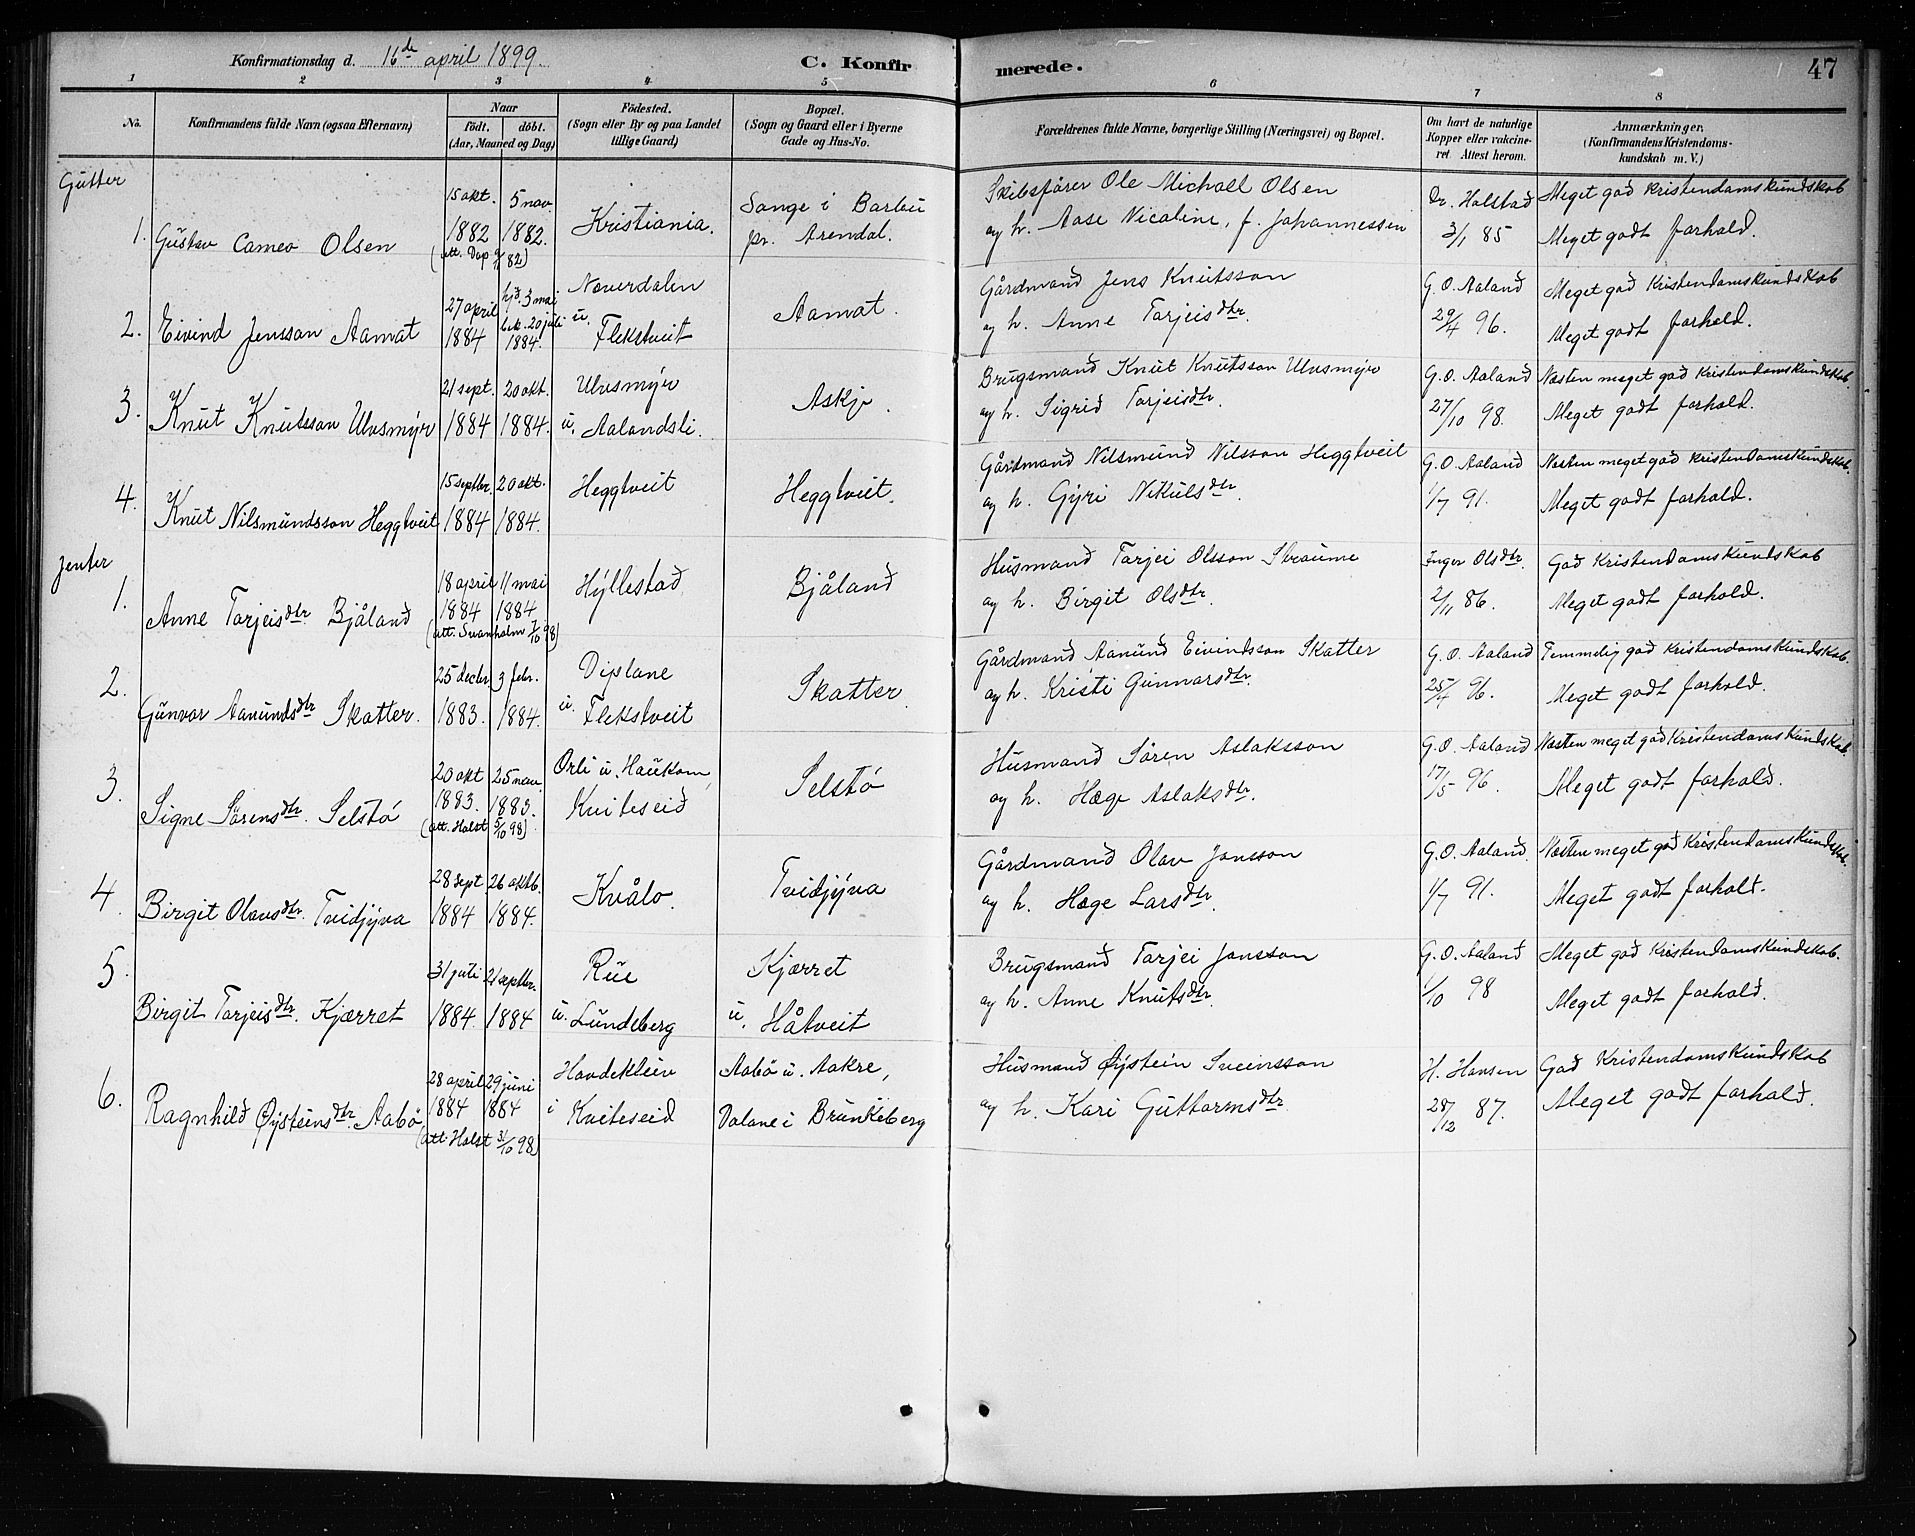 SAKO, Lårdal kirkebøker, G/Ga/L0003: Klokkerbok nr. I 3, 1891-1918, s. 47